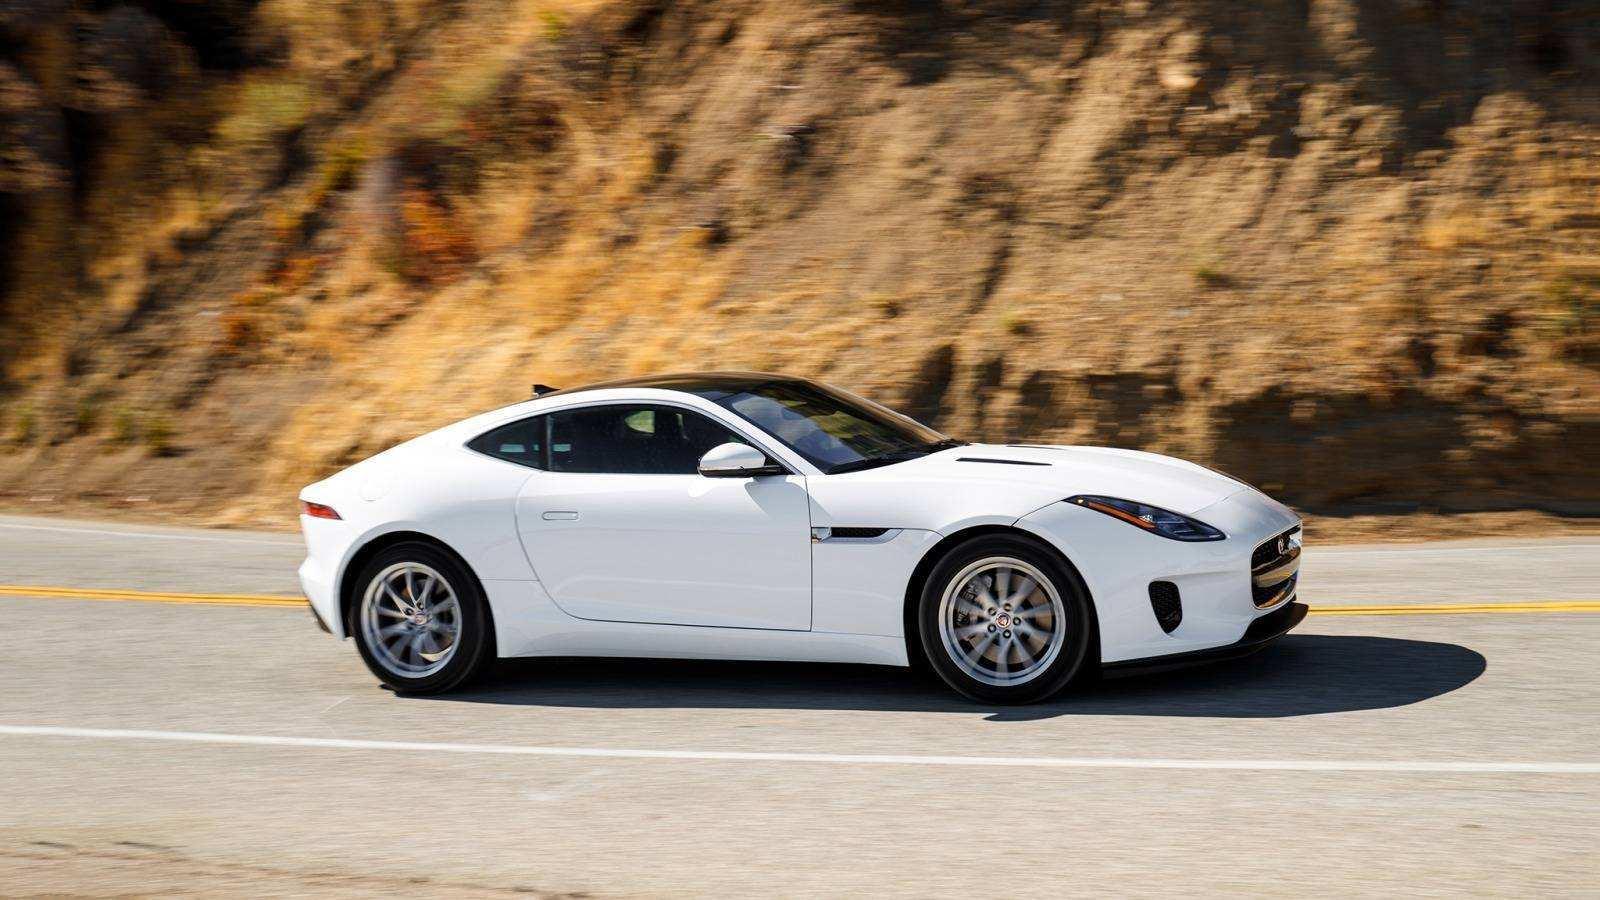 98 The Jaguar F Type 2019 Review Performance by Jaguar F Type 2019 Review